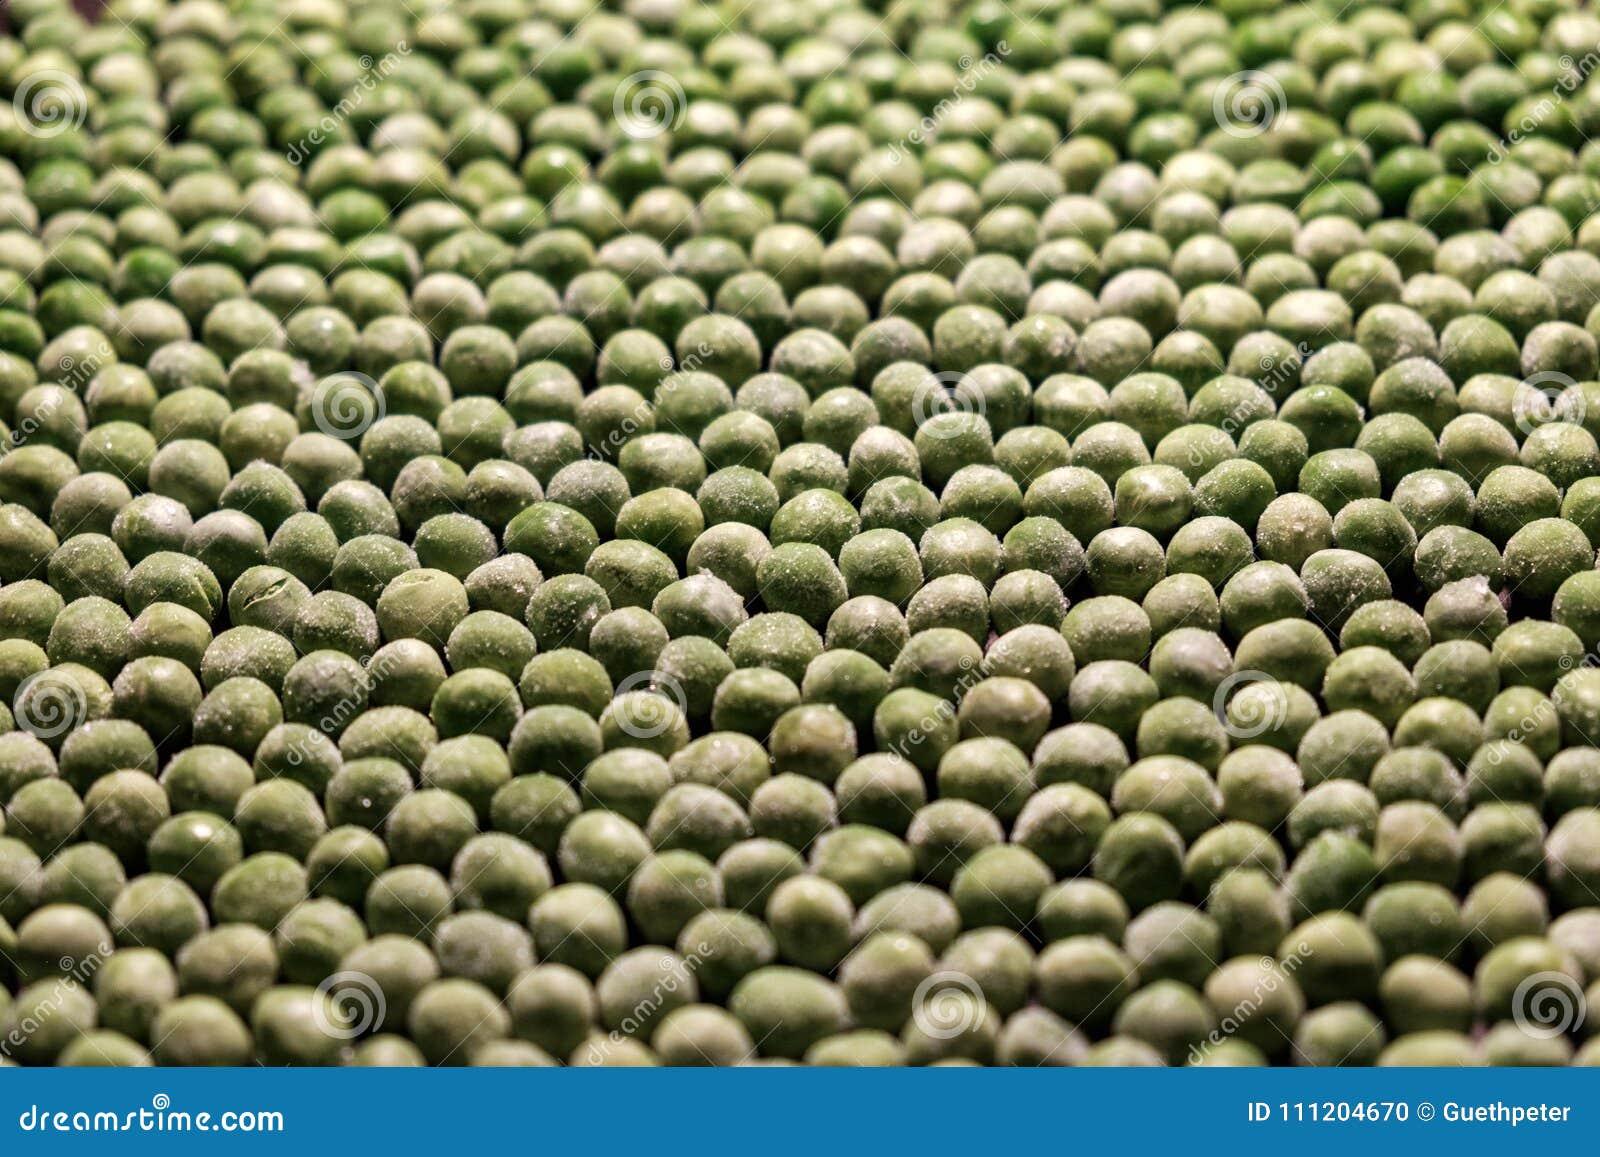 Natural Patterns - Green Pea Stock Photo - Image of ingredient, life ...